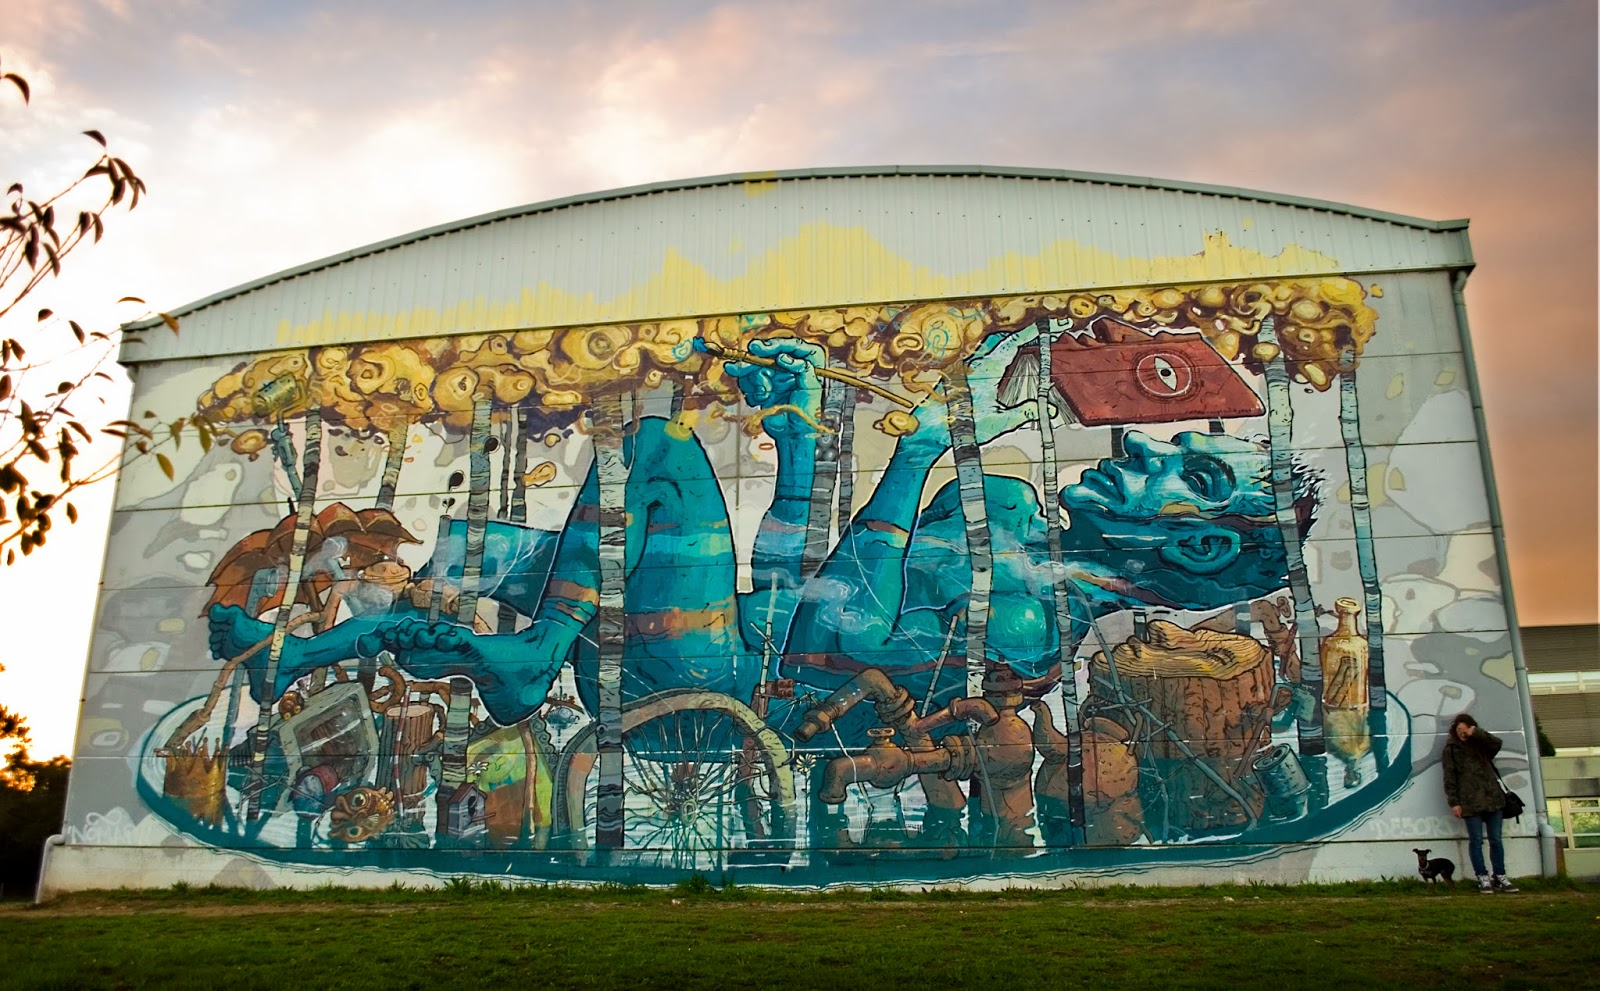 Riquiño-new-mural-at-desordes-creativas-2013-02